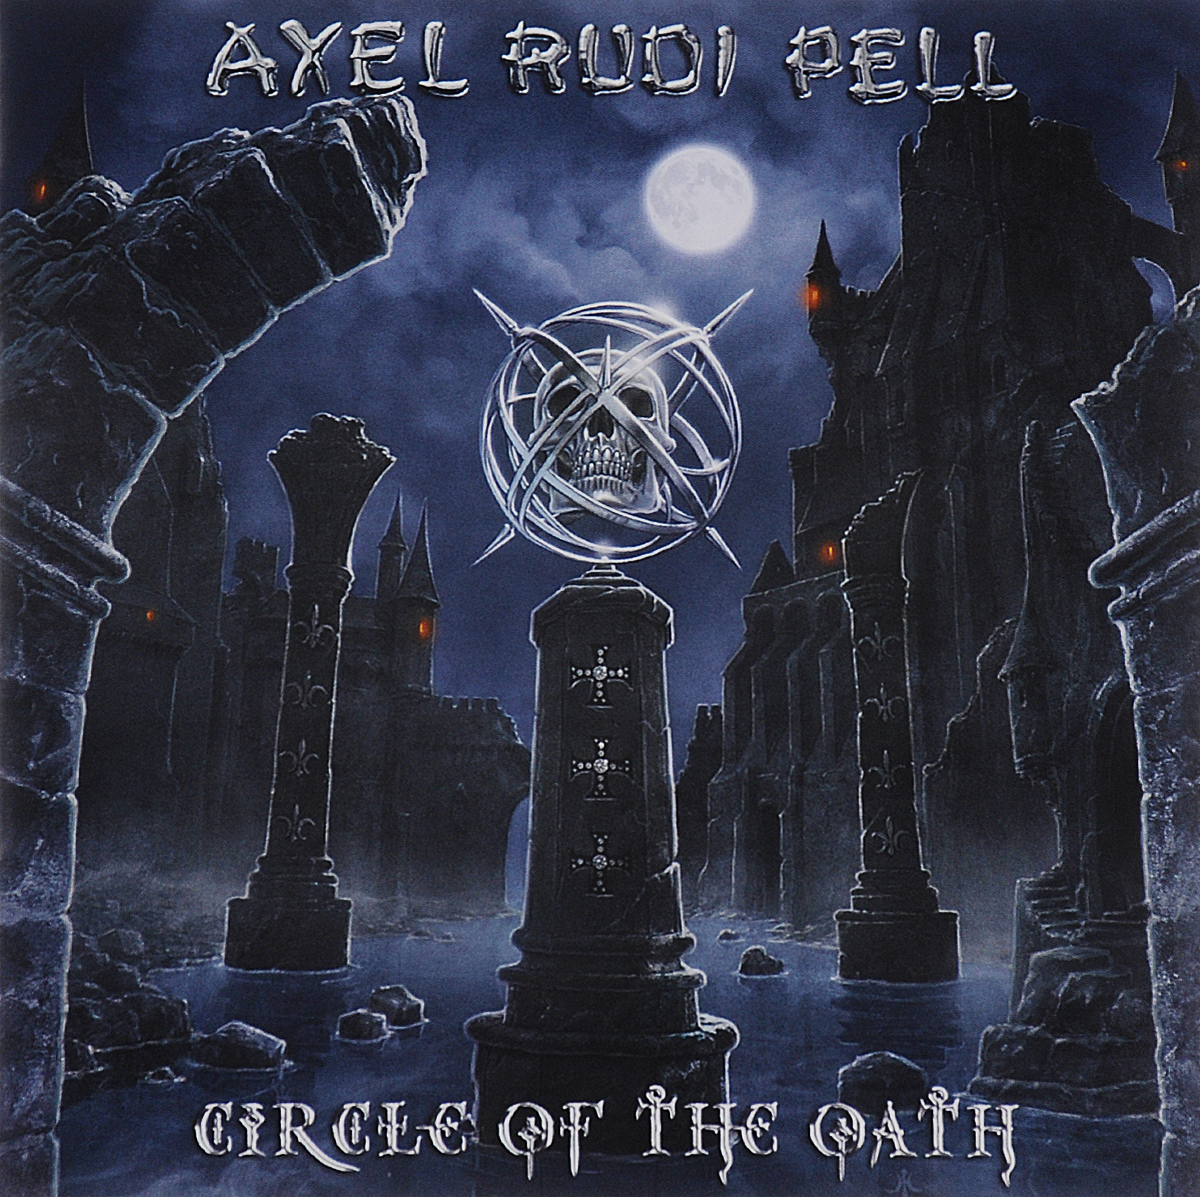 Аксель Руди Пелл Axel Rudi Pell. Circle Of The Oath аксель руди пелл axel rudi pell shadow zone re release 2lp cd